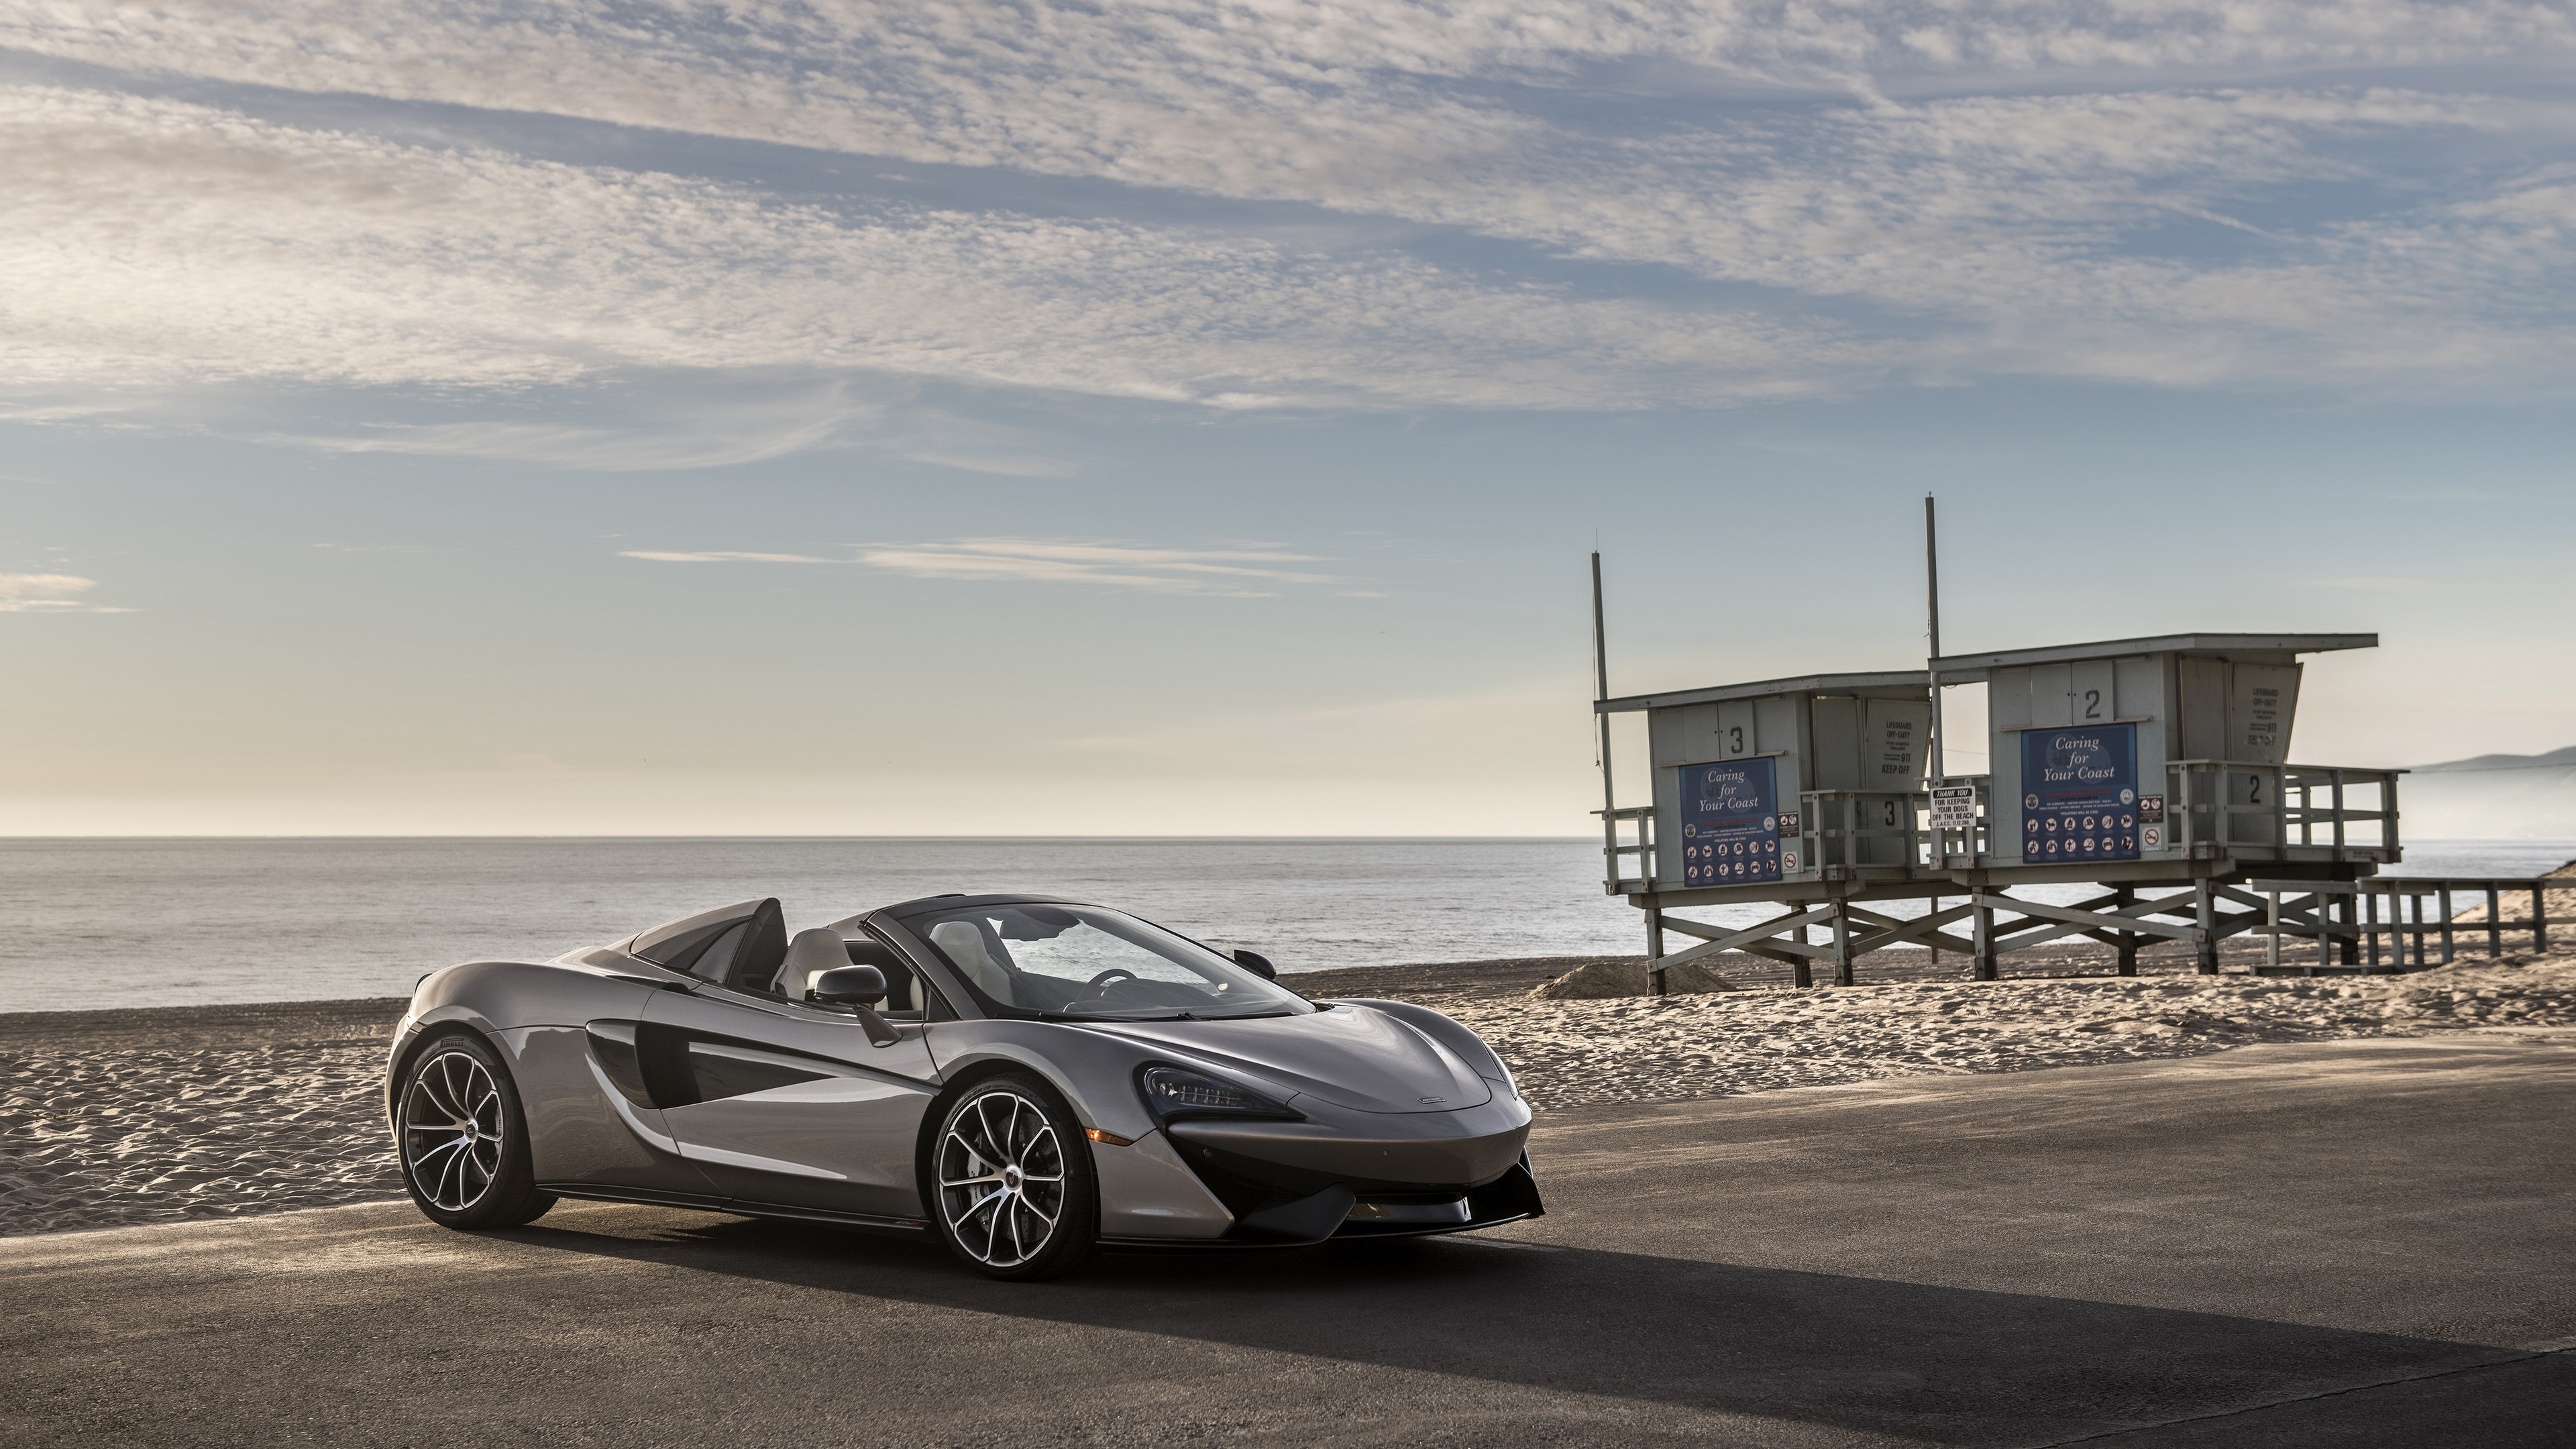 mclaren 570s sports car 4k 1539110069 - McLaren 570S Sports Car 4k - mclaren wallpapers, mclaren 570s spider wallpapers, hd-wallpapers, cars wallpapers, 4k-wallpapers, 2018 cars wallpapers